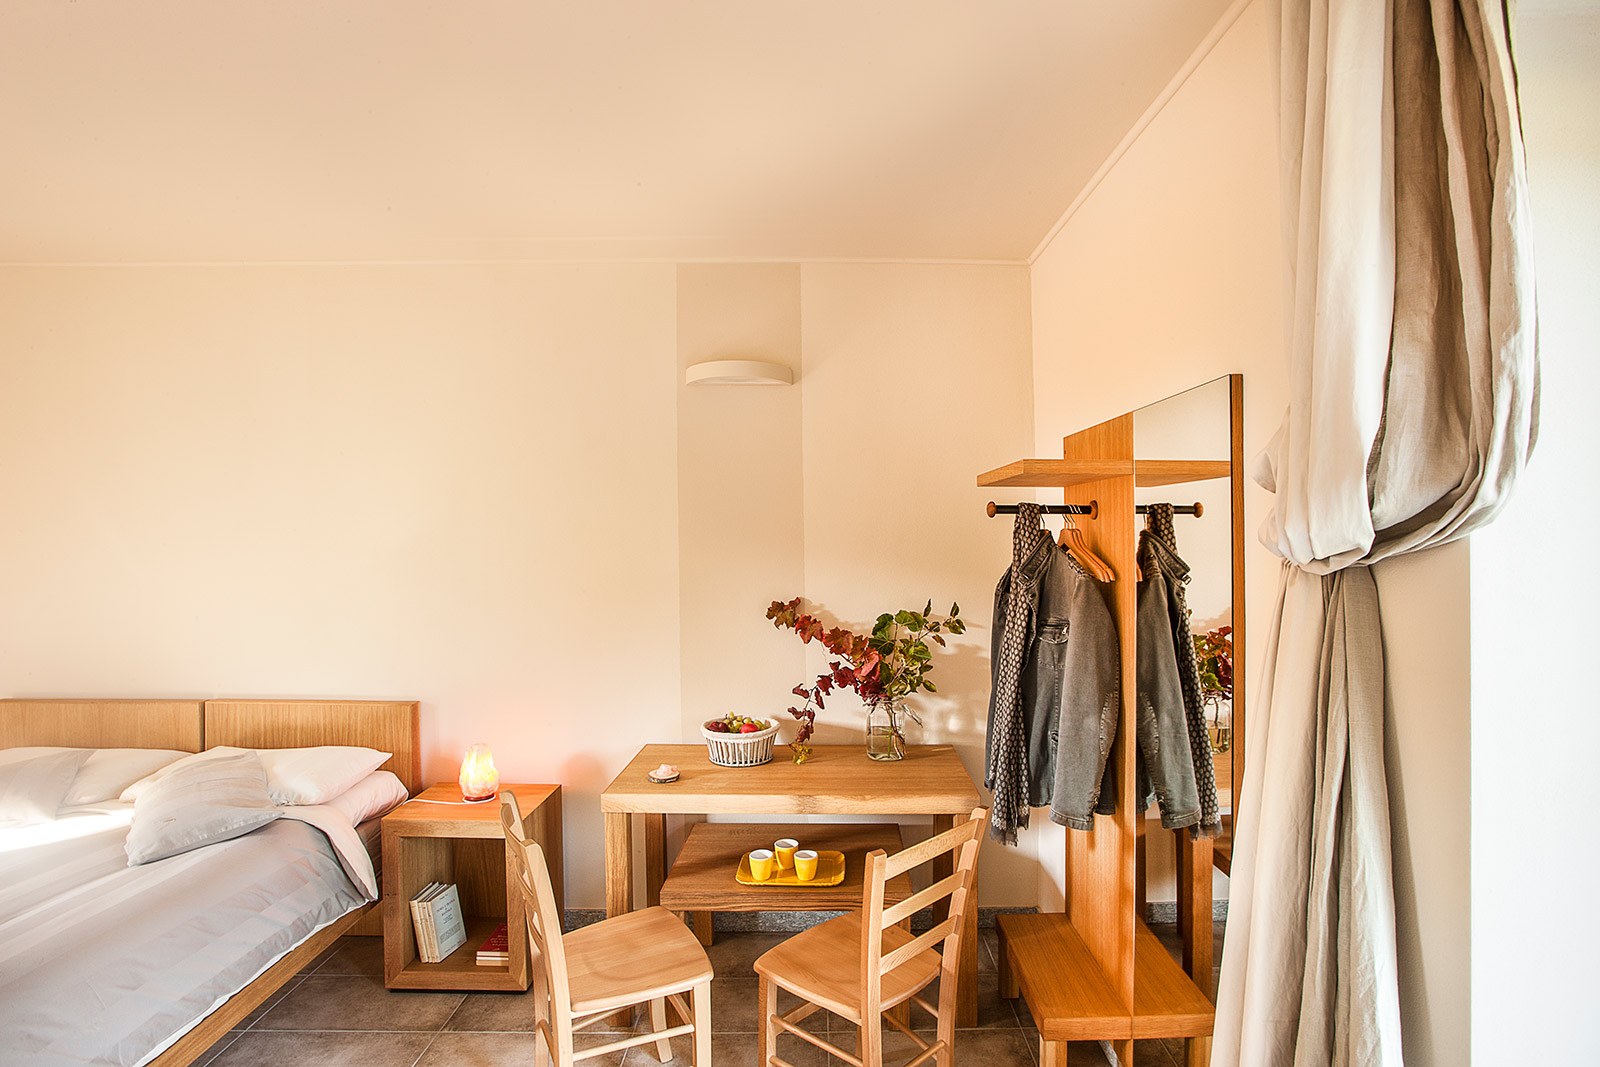 Room at Casa Marghetita B&B for Piedmont Holidays un Italy